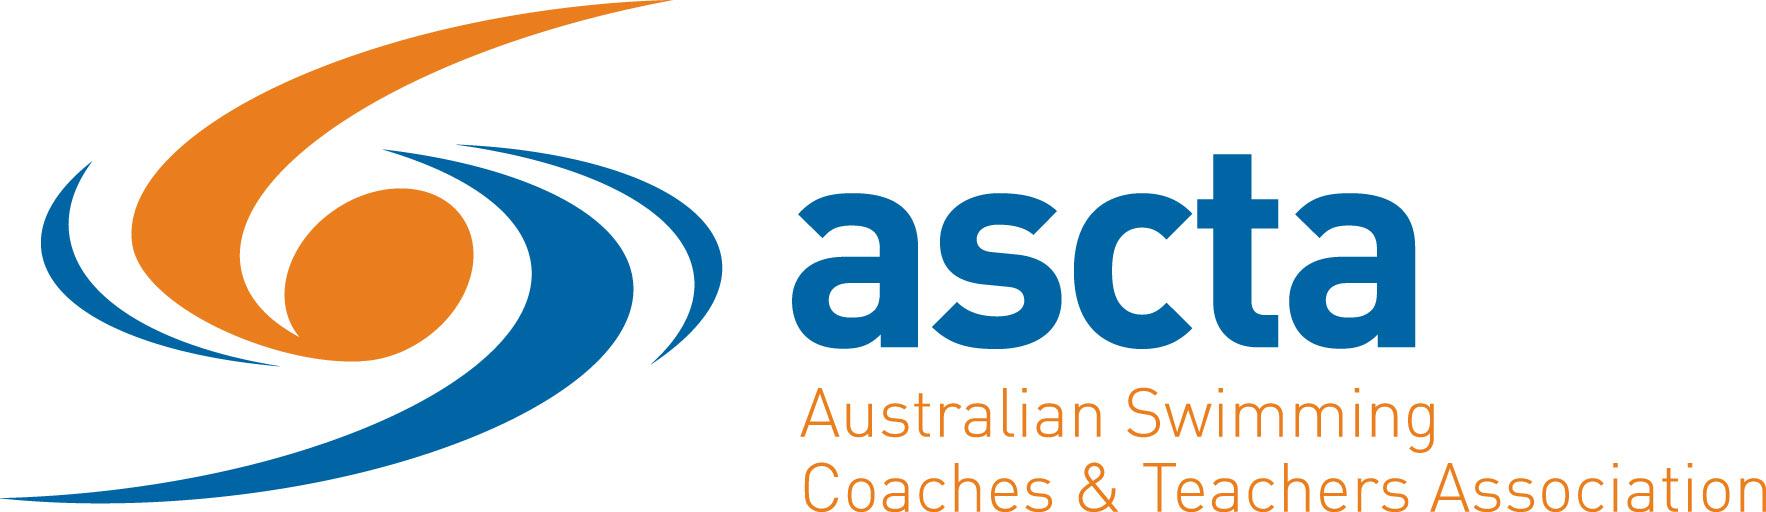 ASCTA-3-RGB.jpg